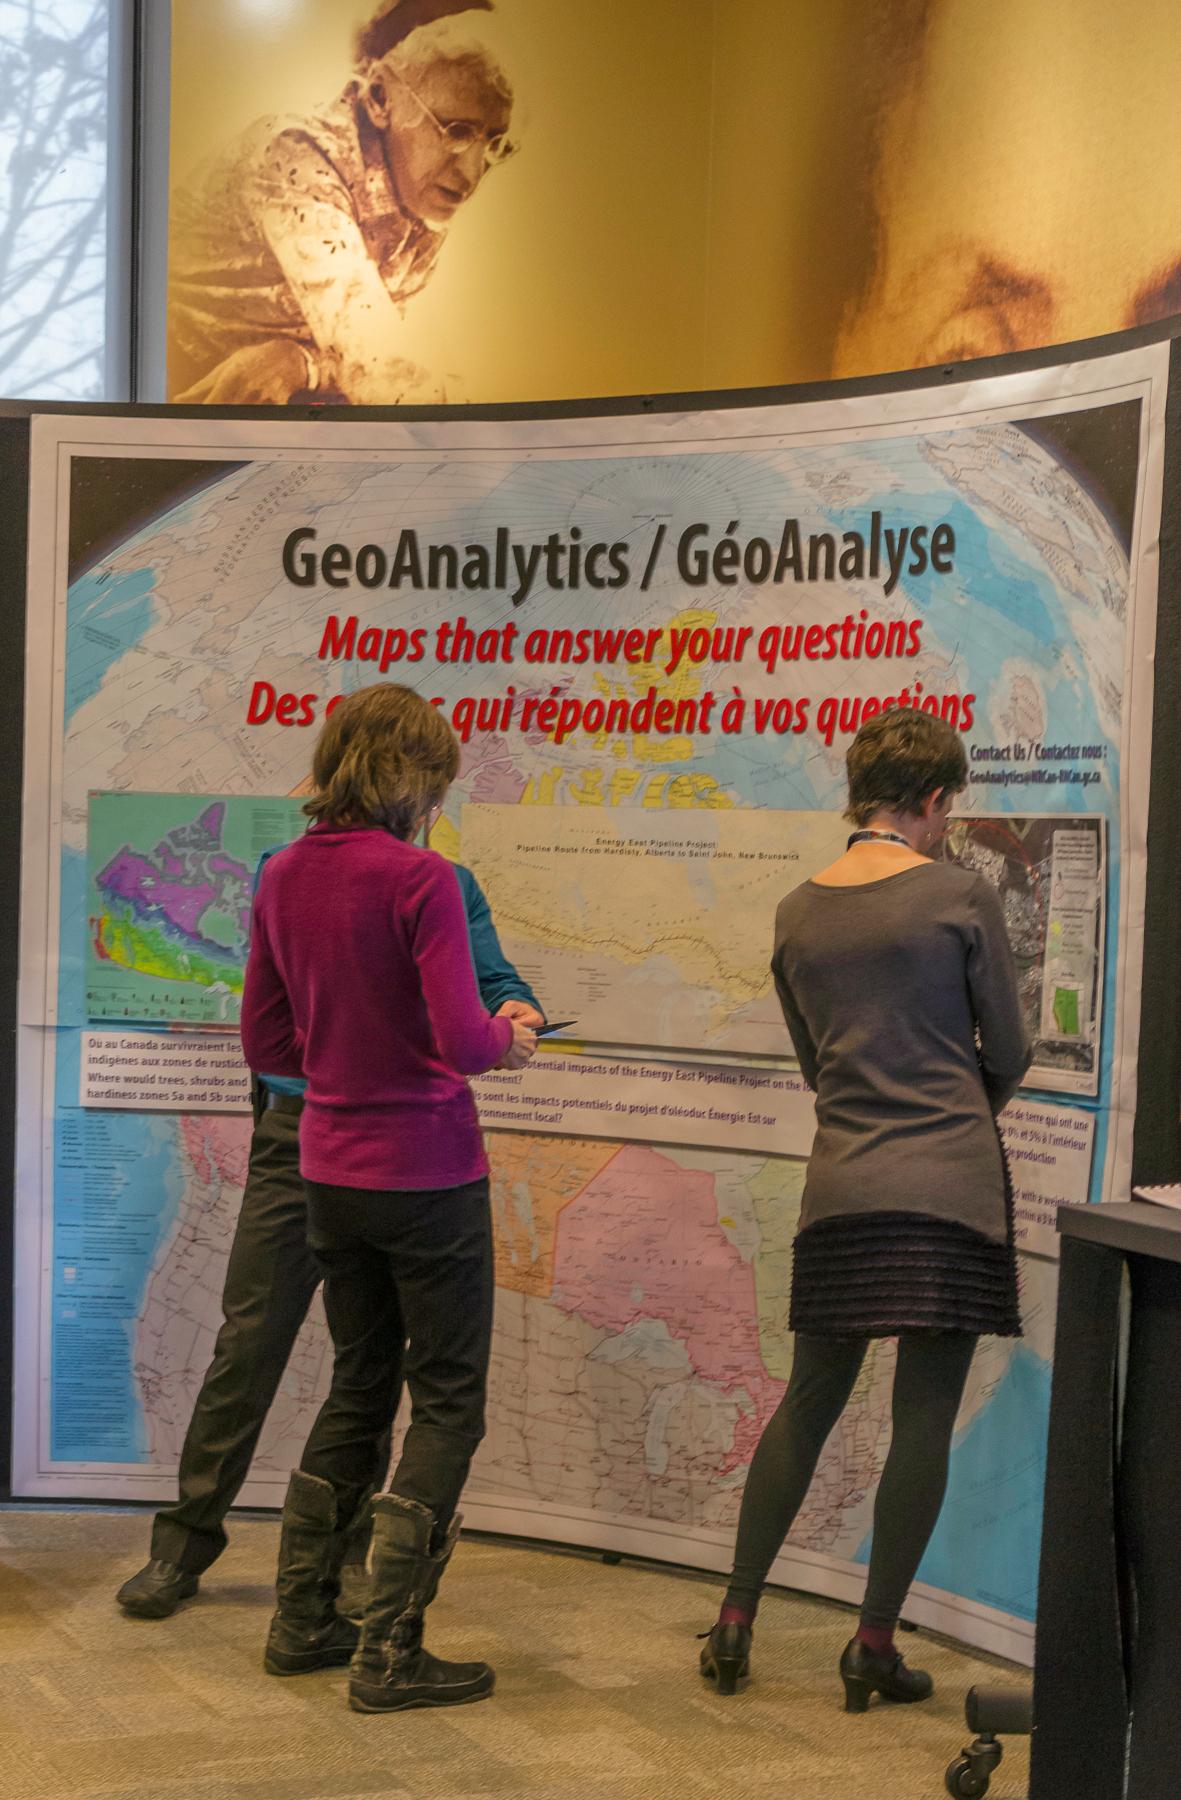 NRCan geoanalytics